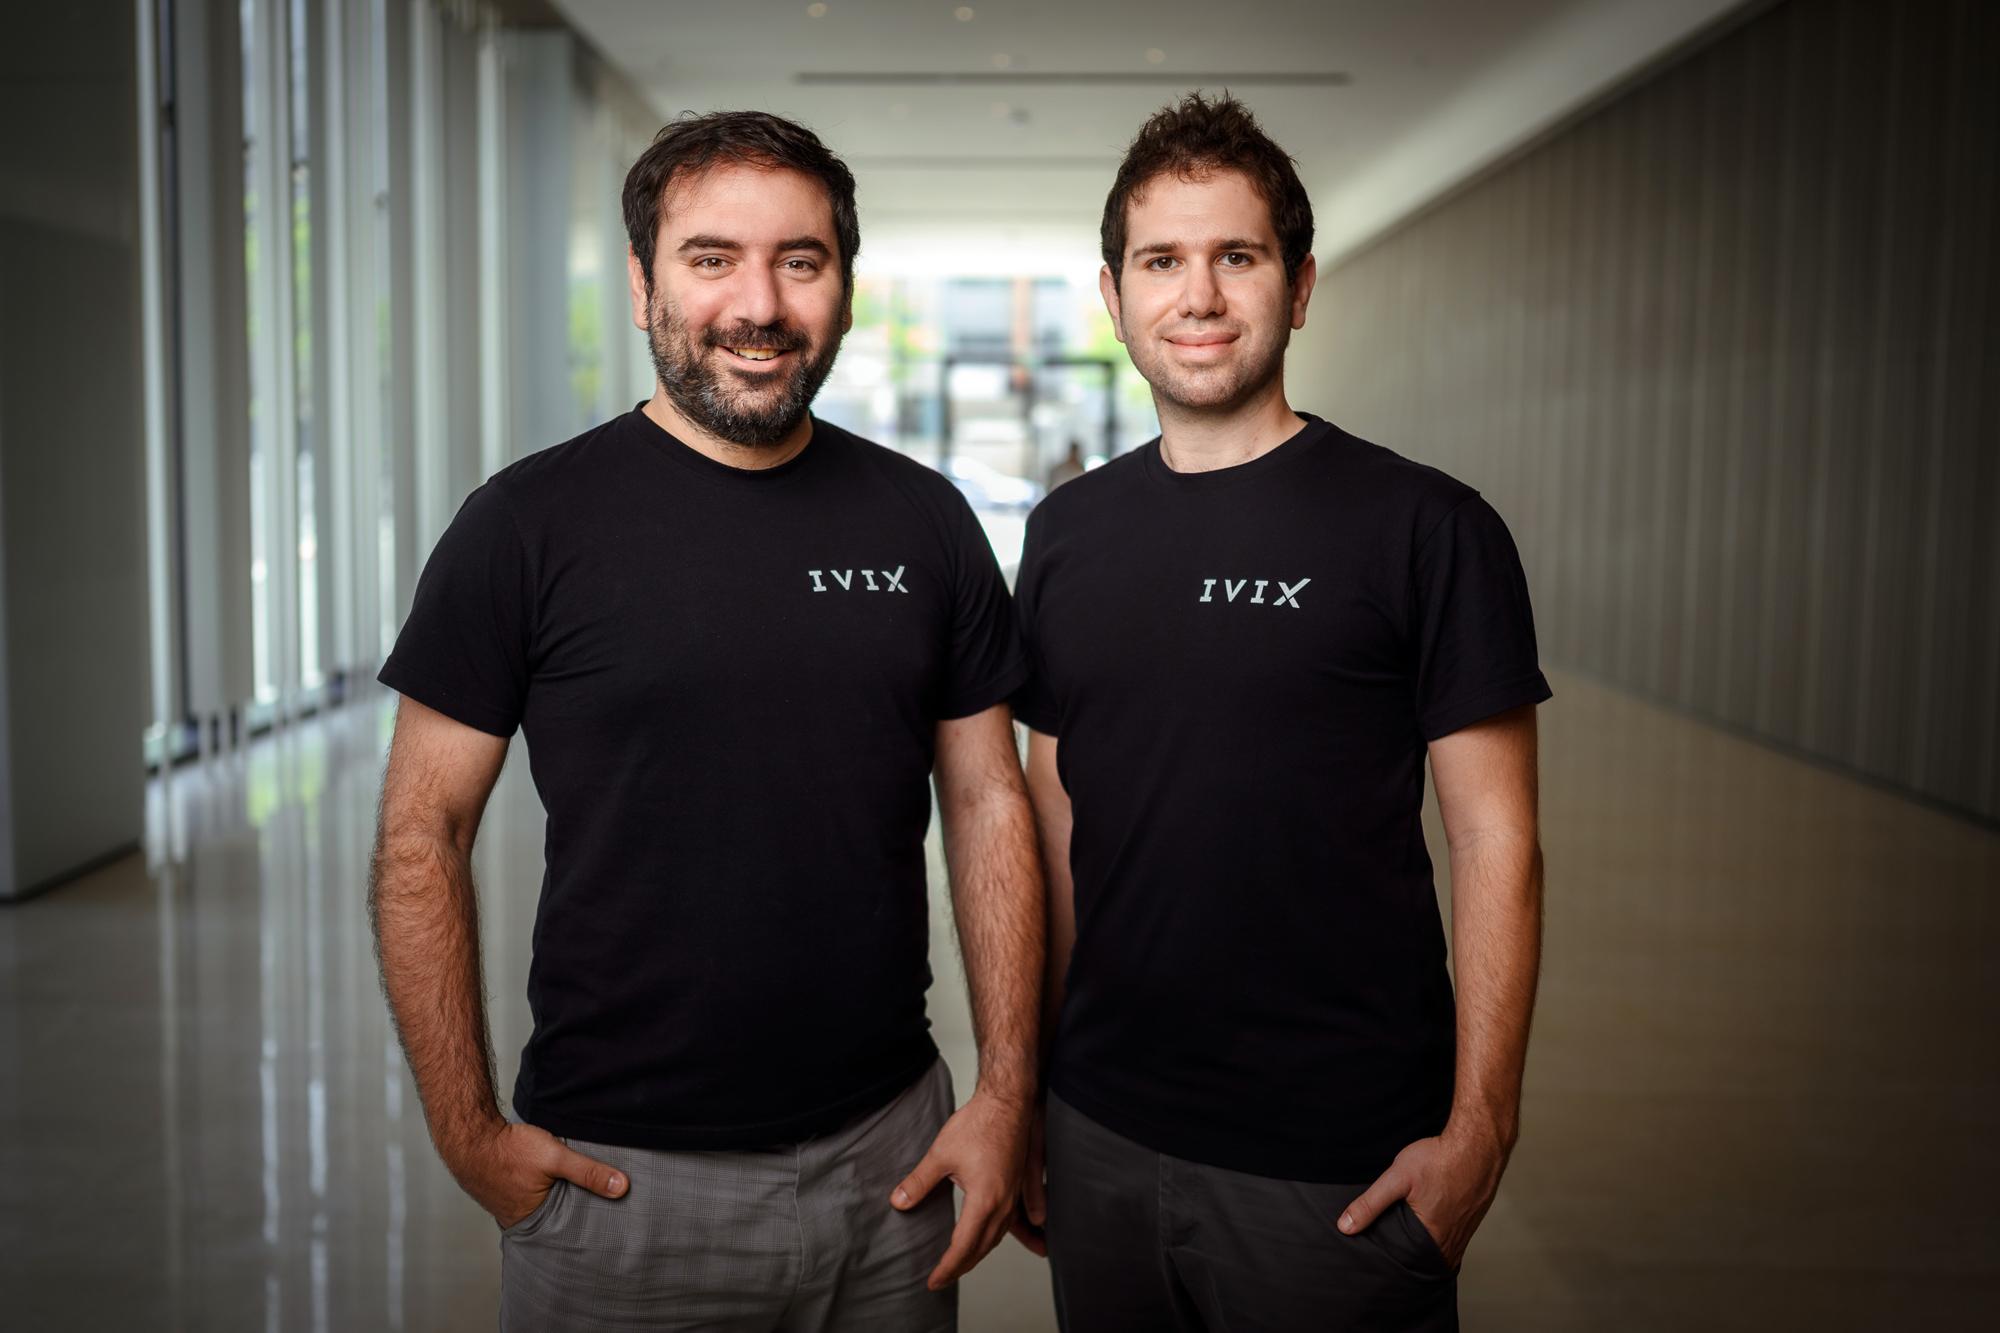 IVIX founders Matan Fattal (left) and Doron Passov Photo: Doron Letzter